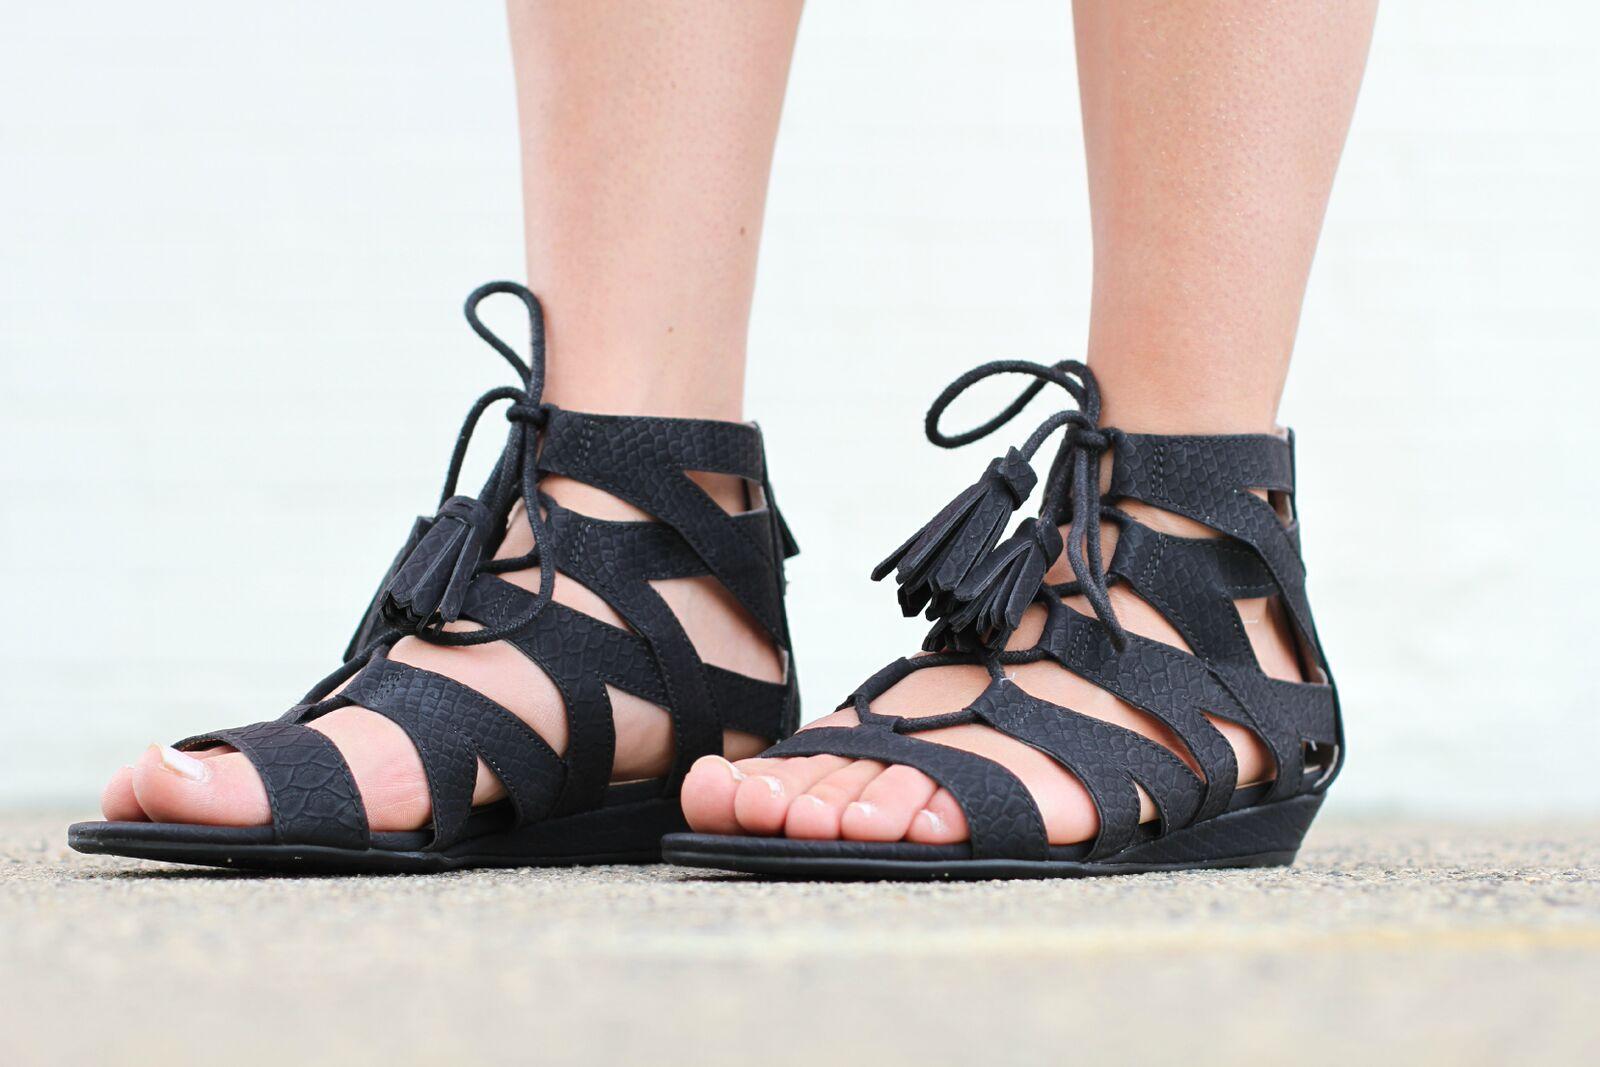 Sam & Libby black gladiator sandals